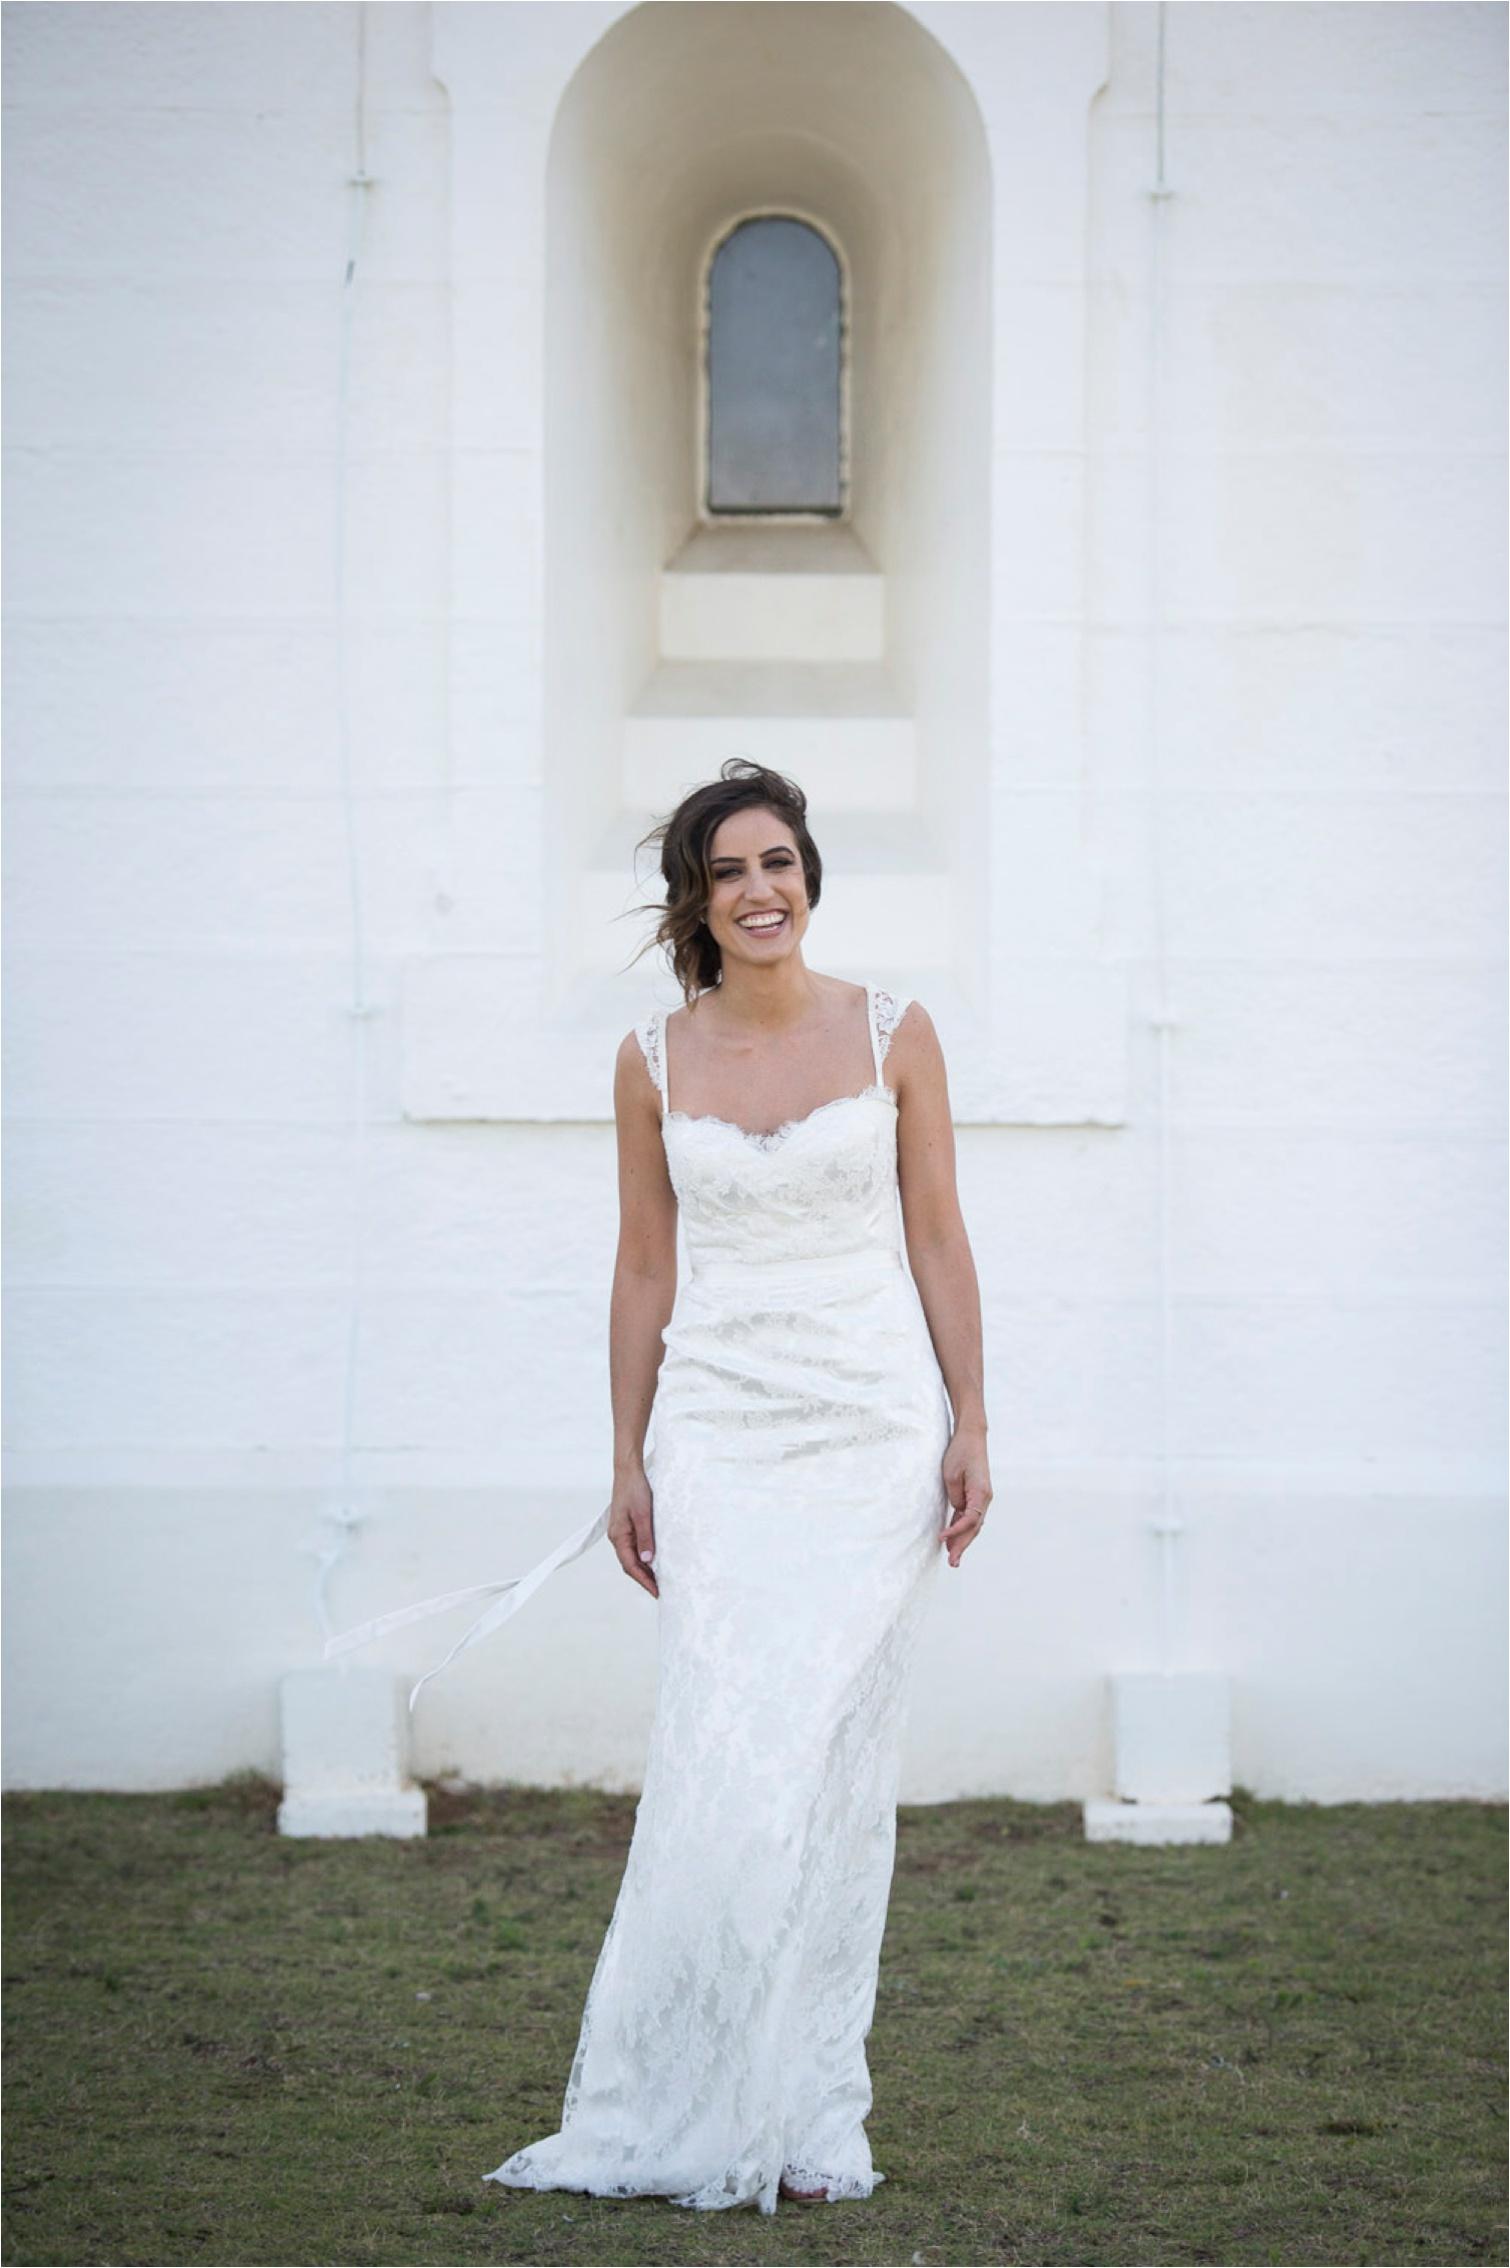 Nicole&Carlie_Watsons_Bay_Hotel_Wedding_by_Gold_Coast_Photographers-The_Follans29.jpg